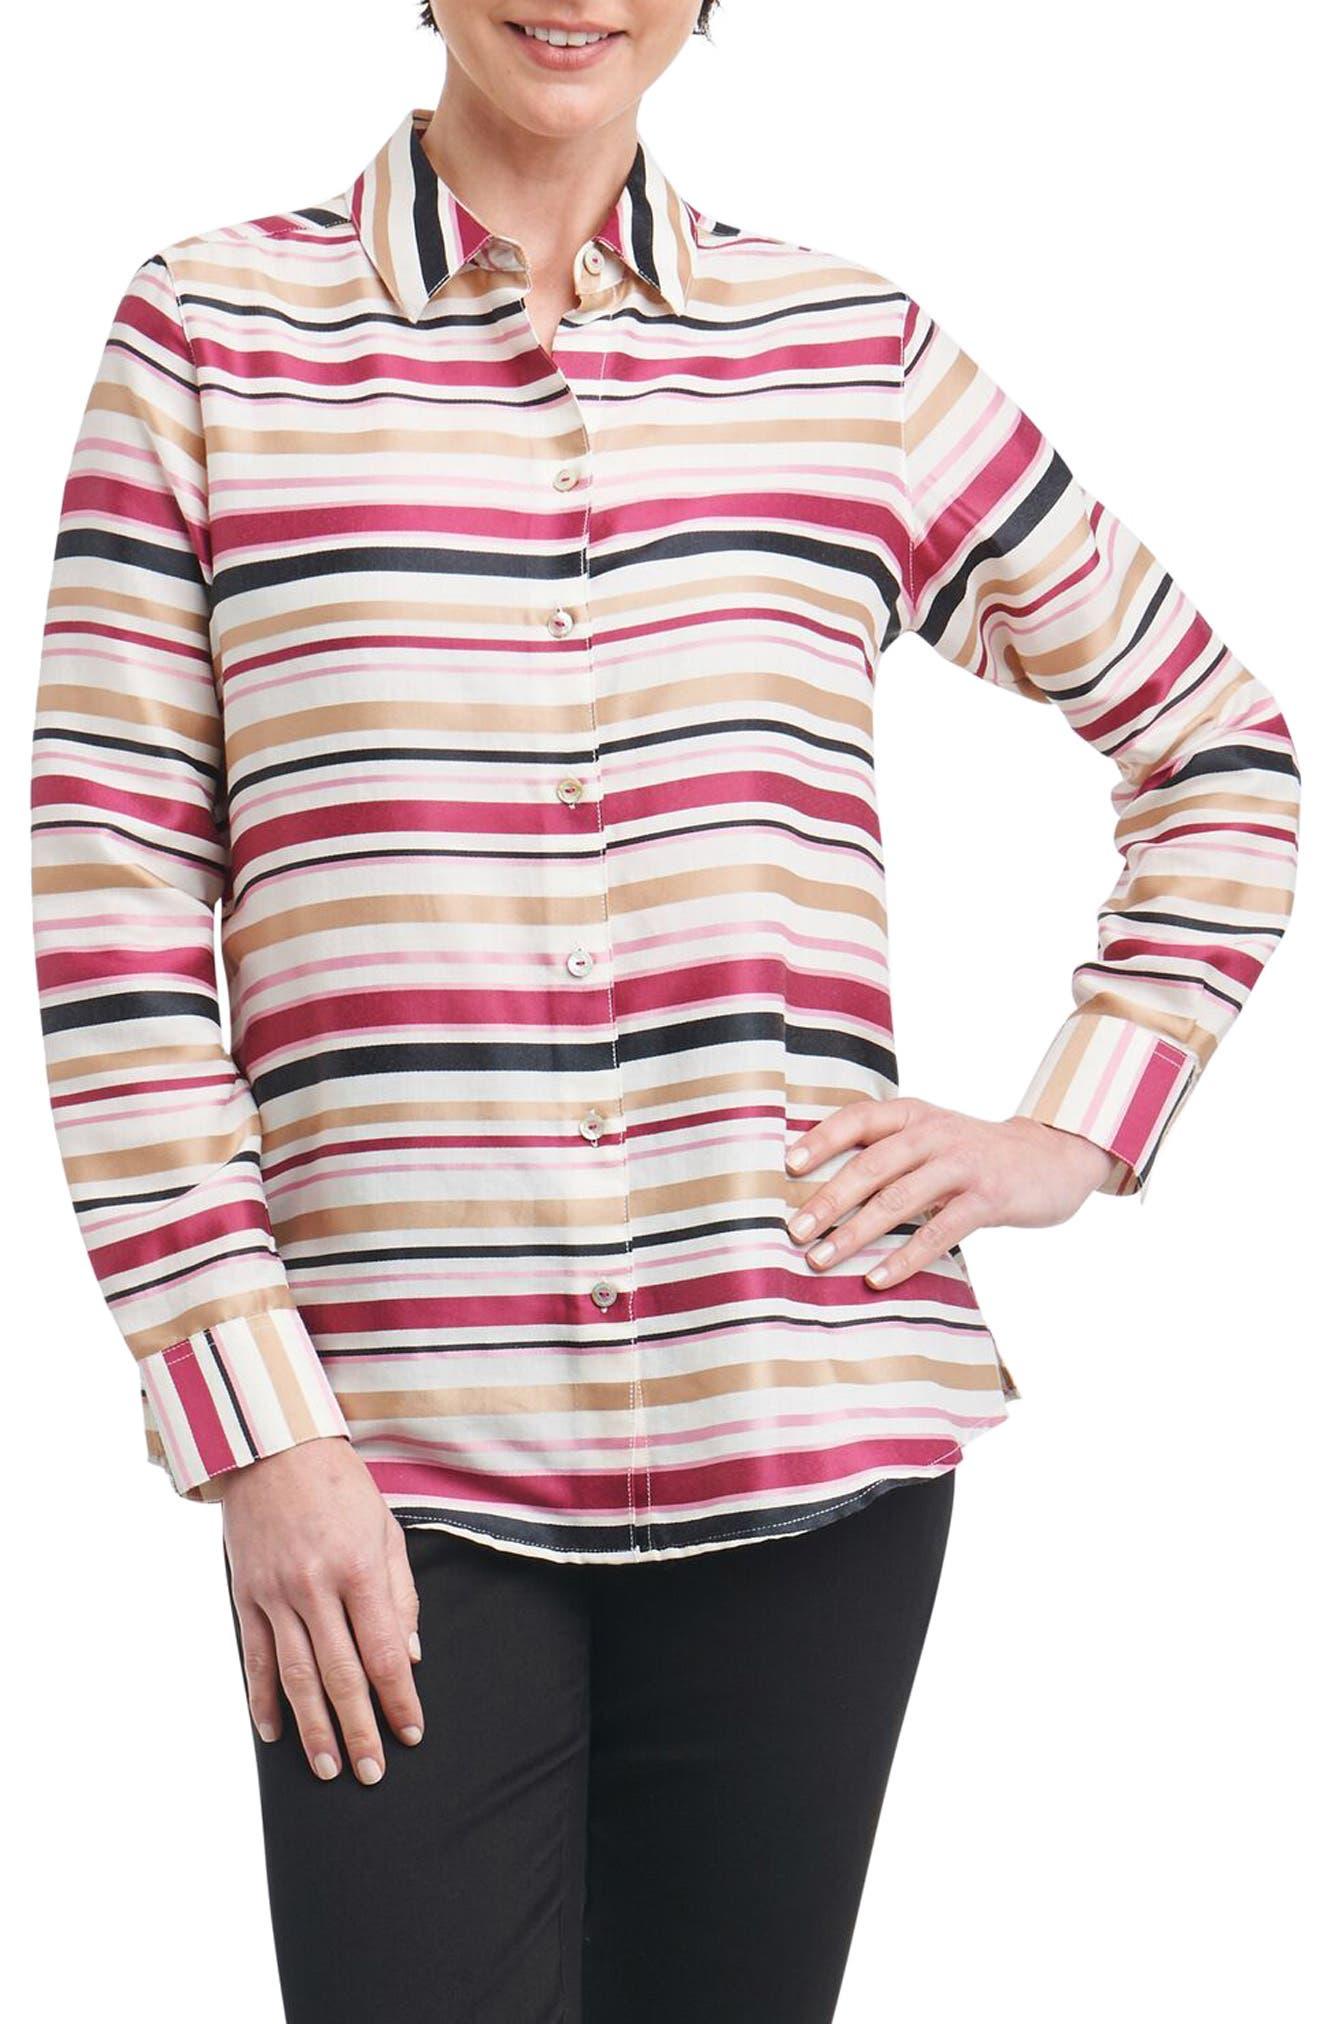 FOXCROFT Addison Stripe Print Sateen Shirt, Main, color, 208